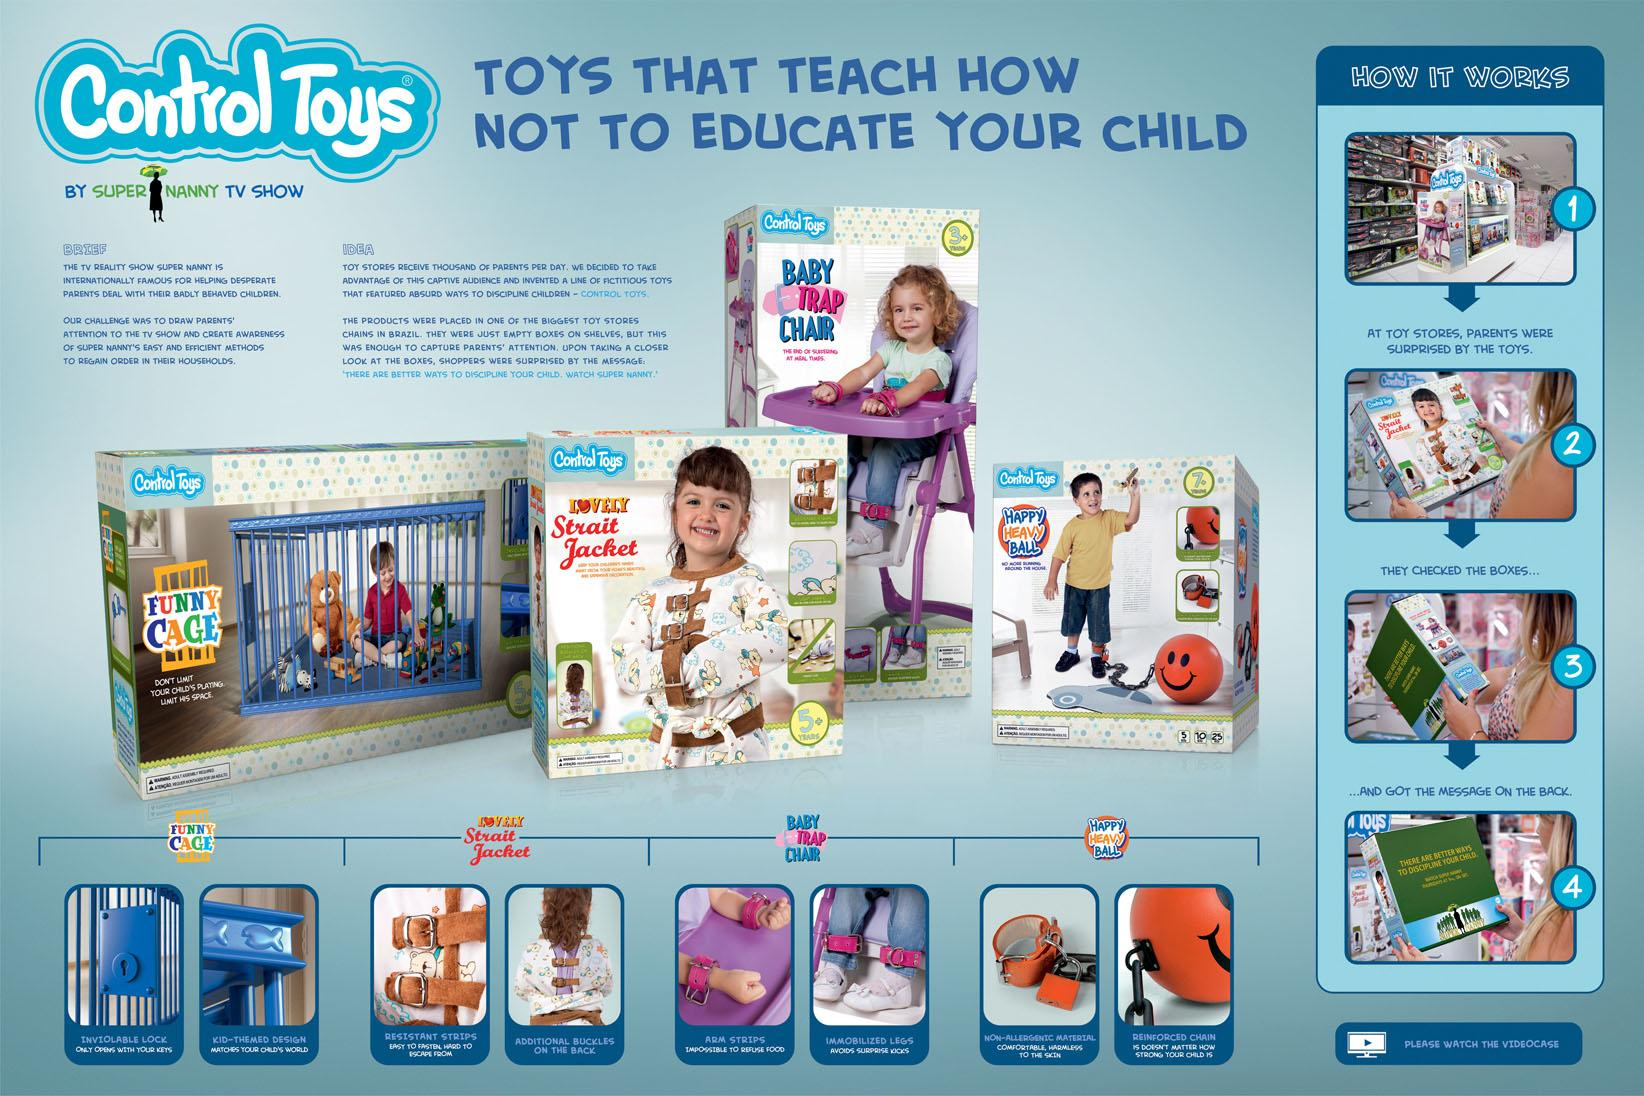 Super Nanny Direct Ad -  Control Toys